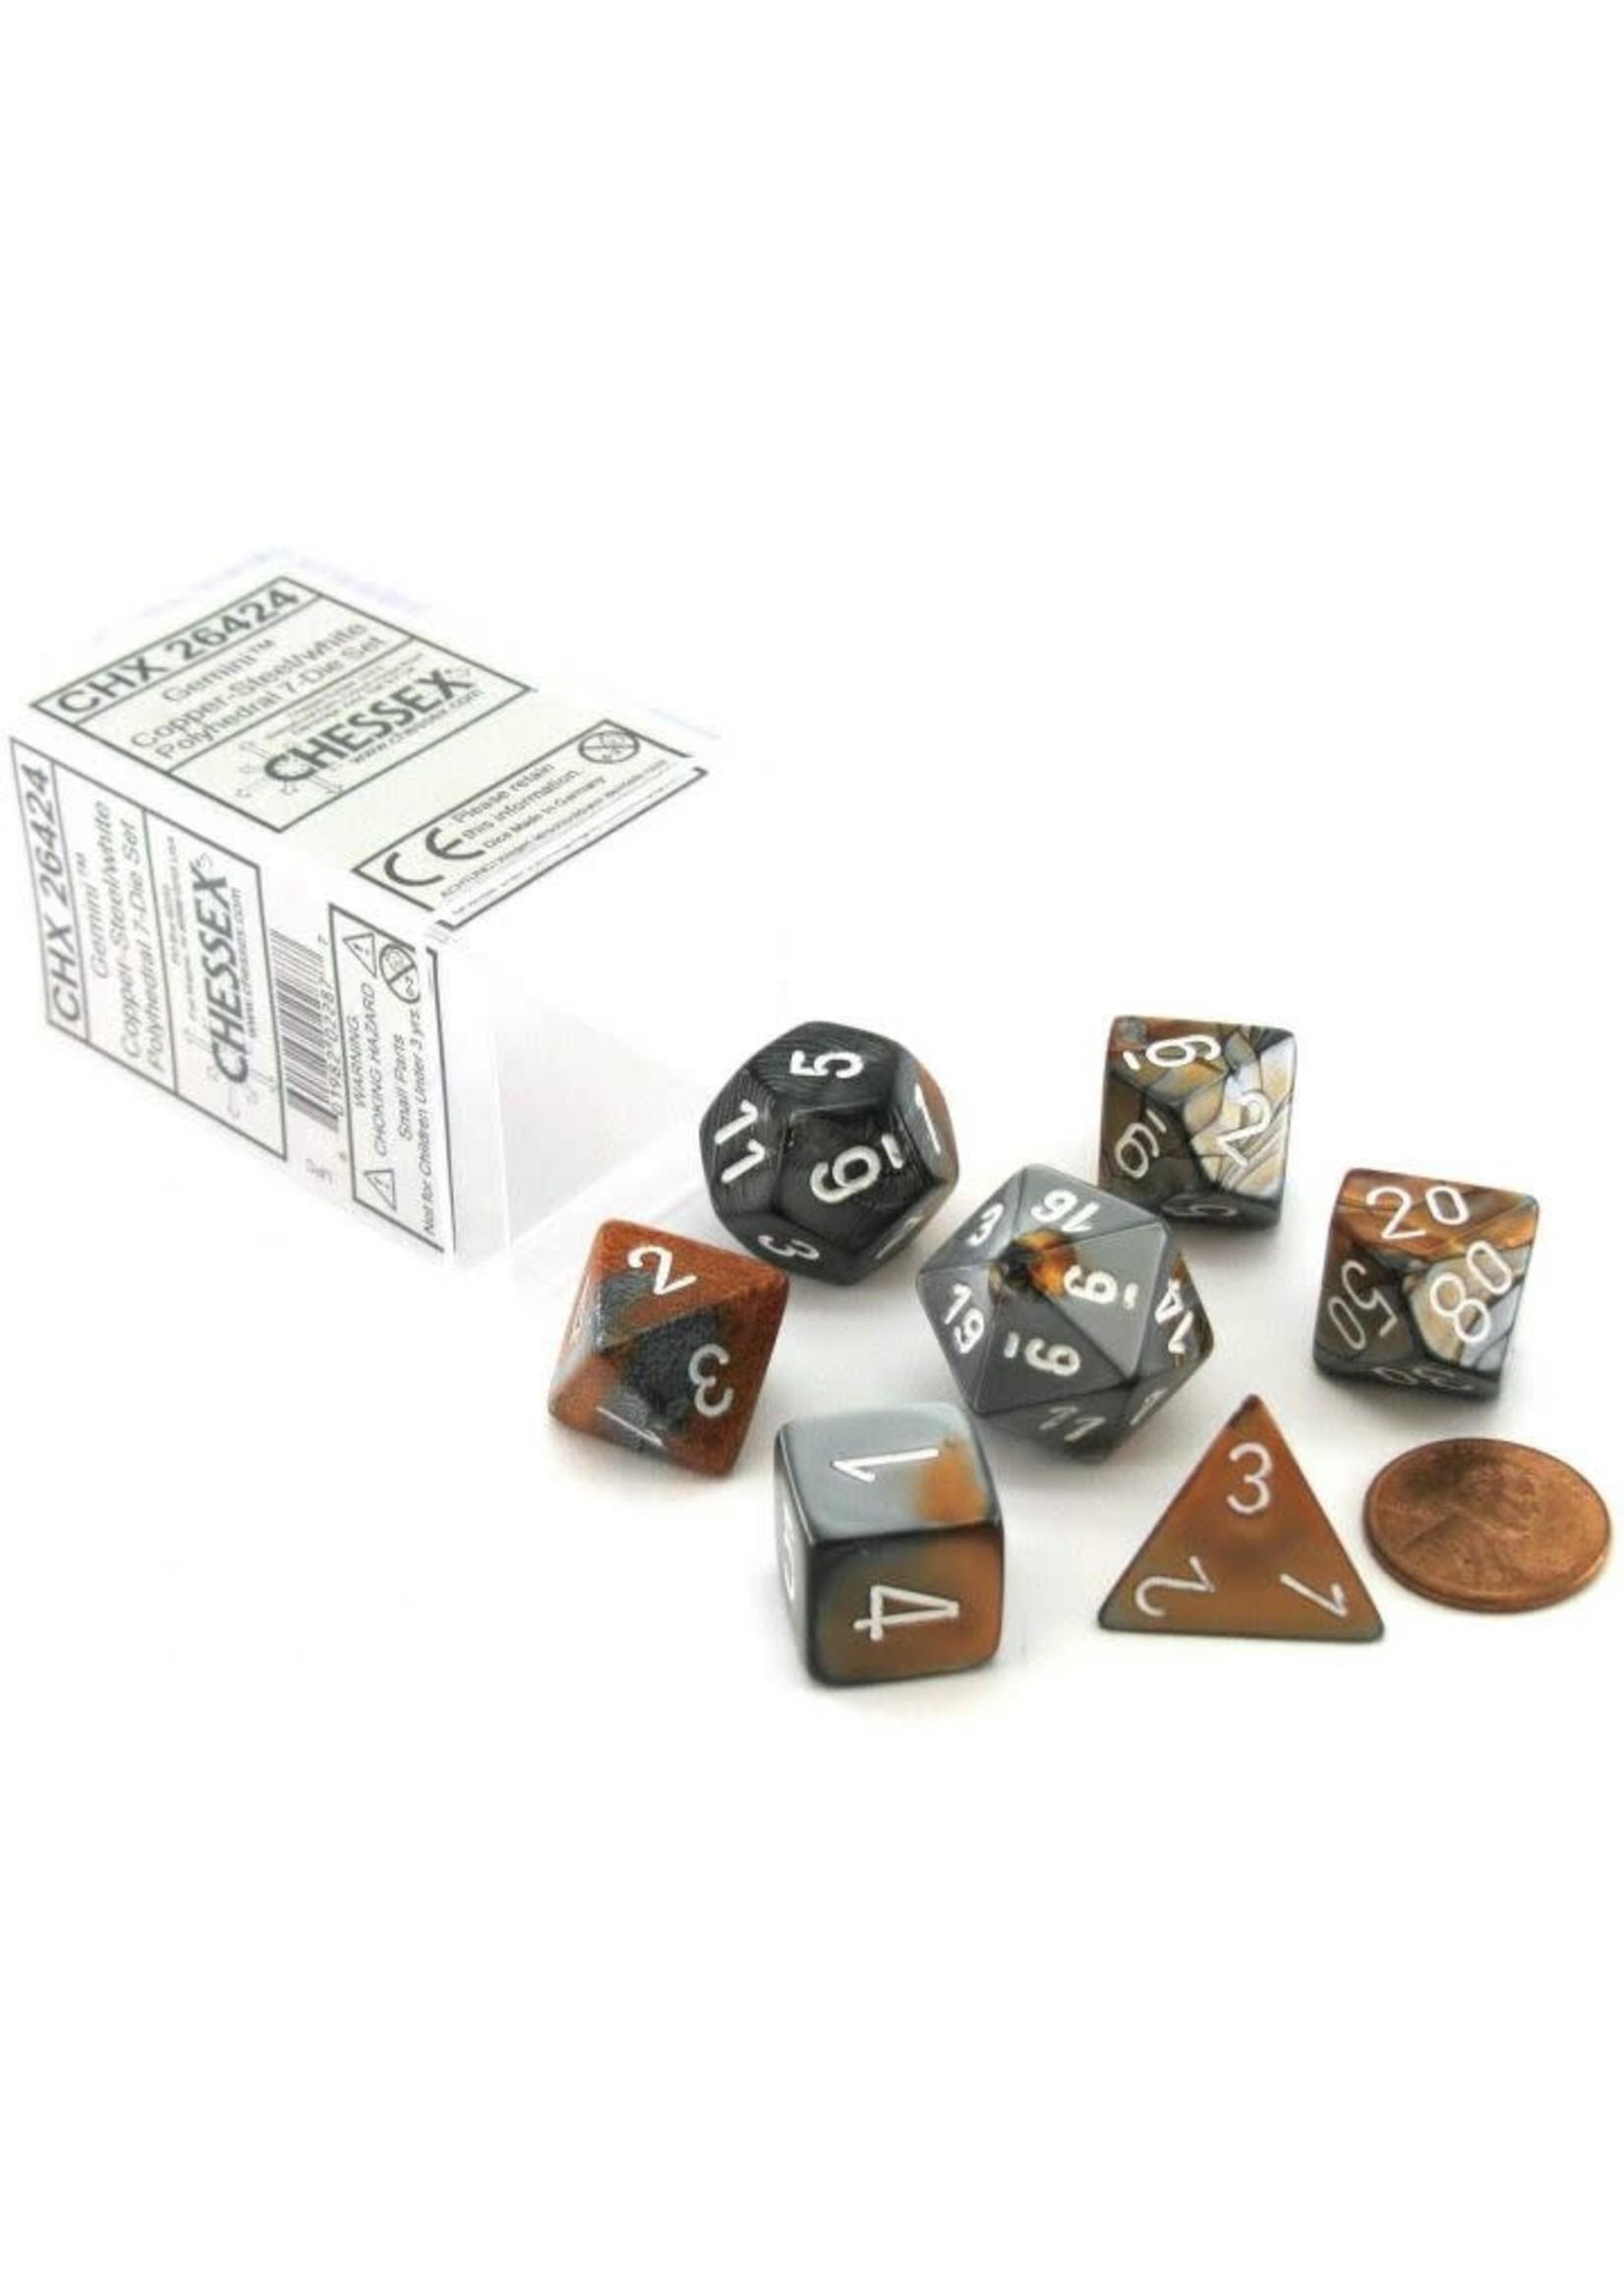 Gemini Polyhedral 7-Die Sets - Copper-Steel W/White